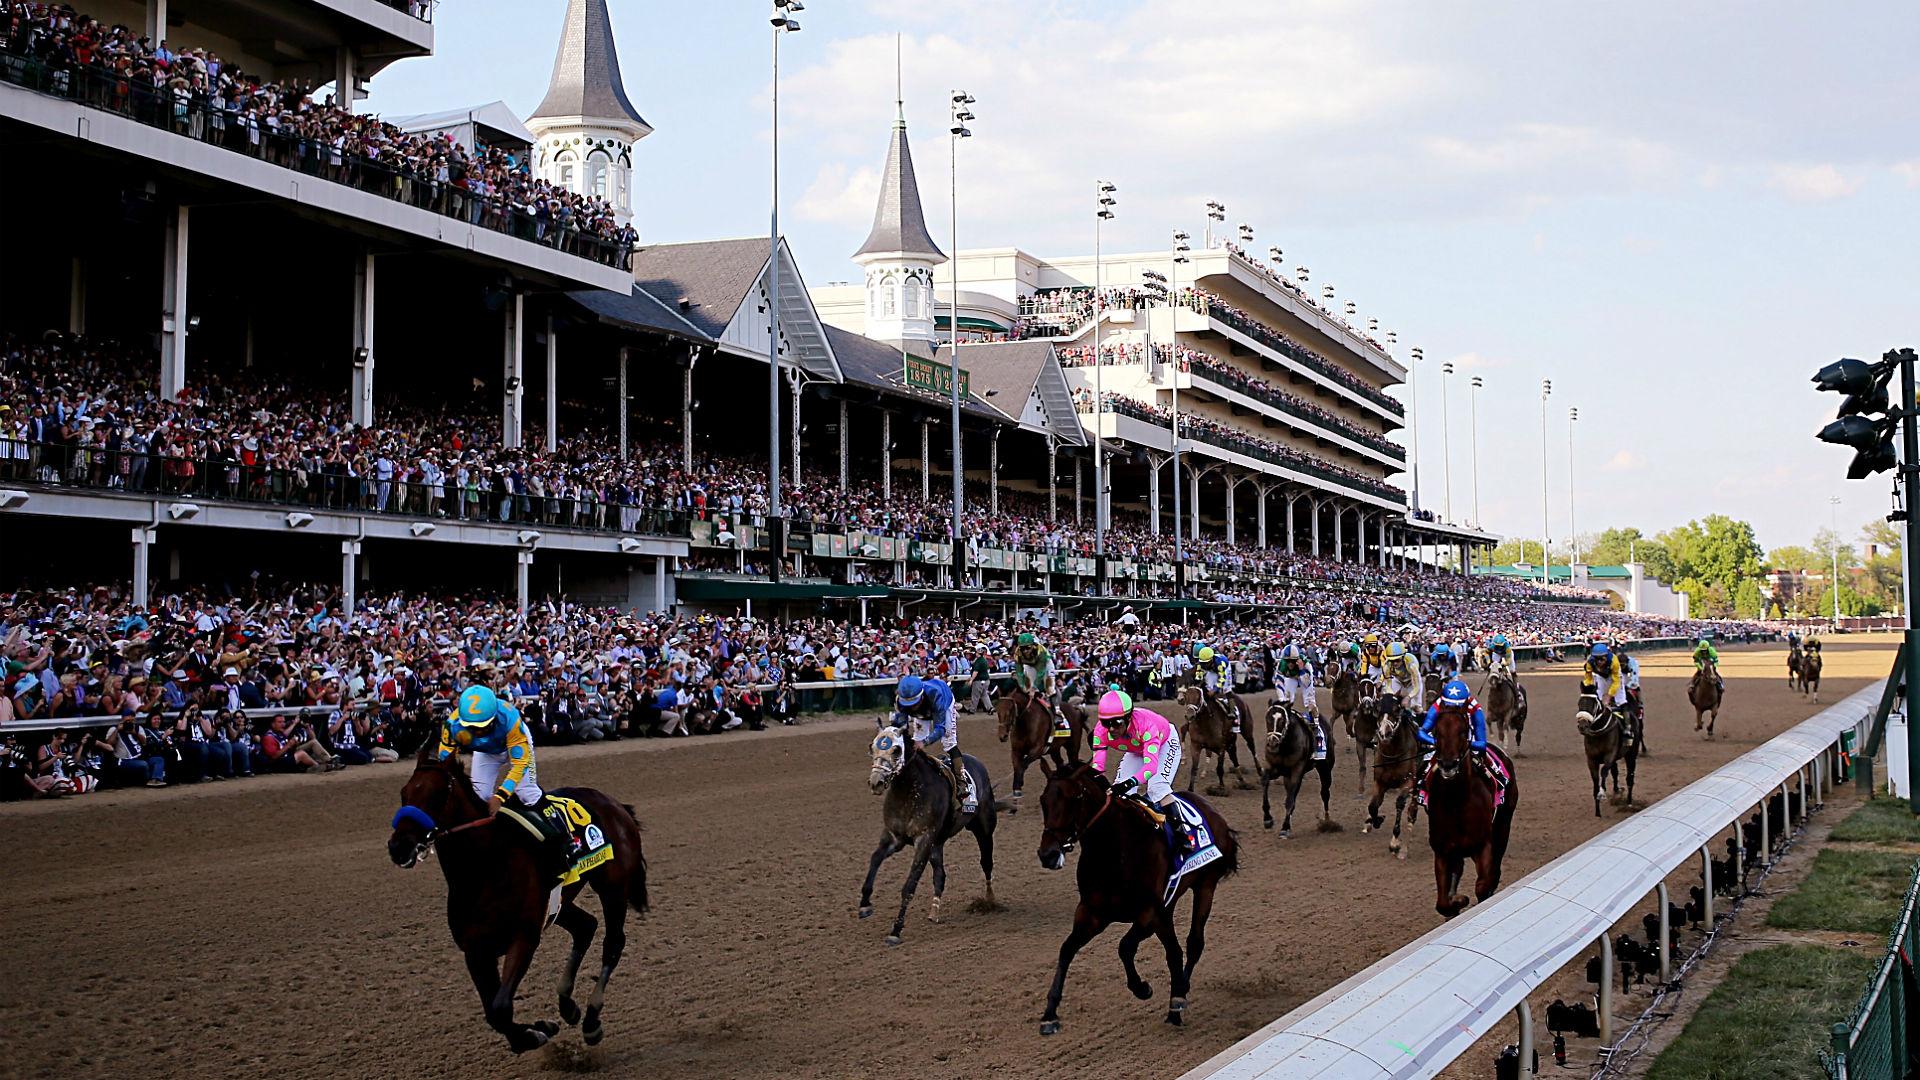 bravado casino kentucky derby early odds